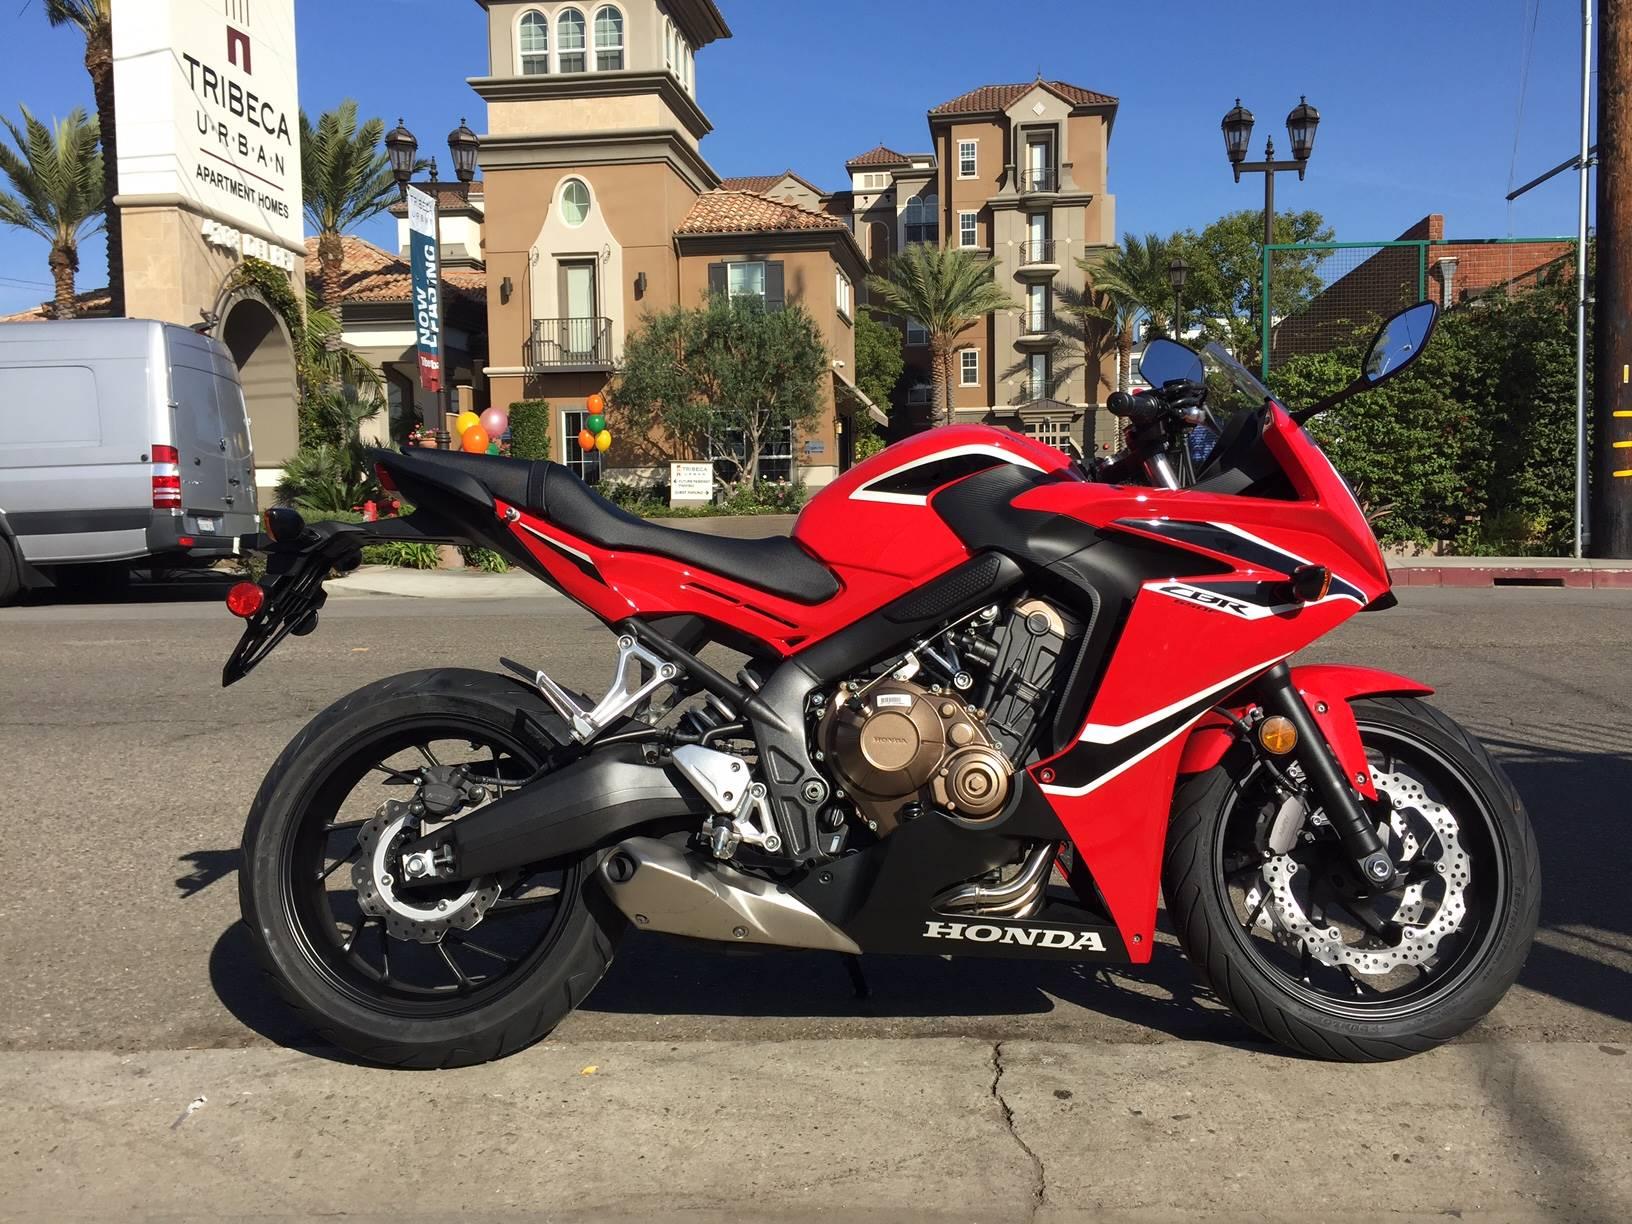 2018 honda cbr650f motorcycles marina del rey ca at geebo for Honda marina del rey